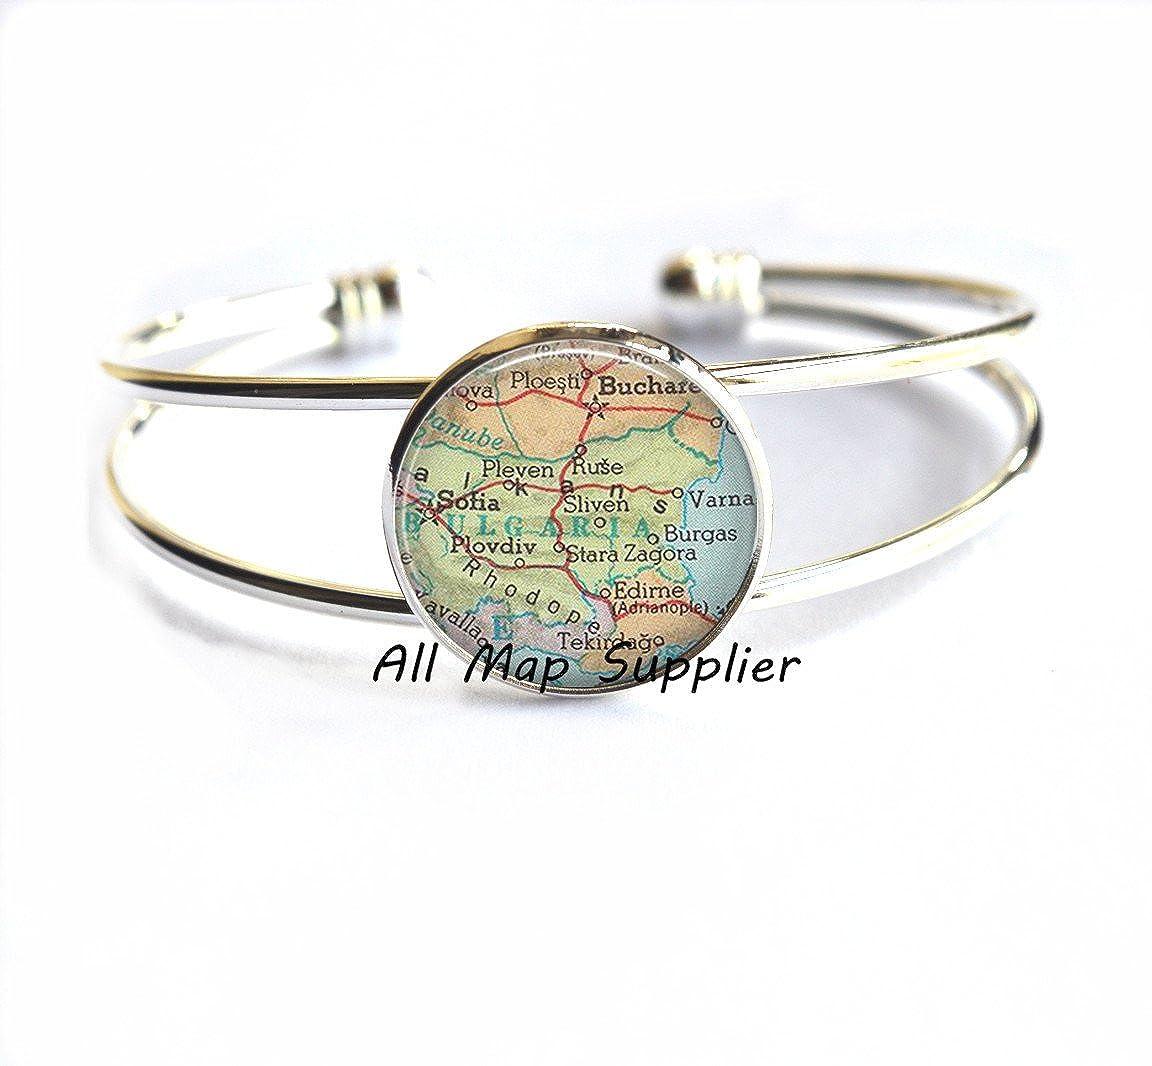 Bulgaria Bracelets Bulgaria Bracelet,AO198 Charming Bracelet,Bulgaria map Bracelets Bulgaria map Bracelet